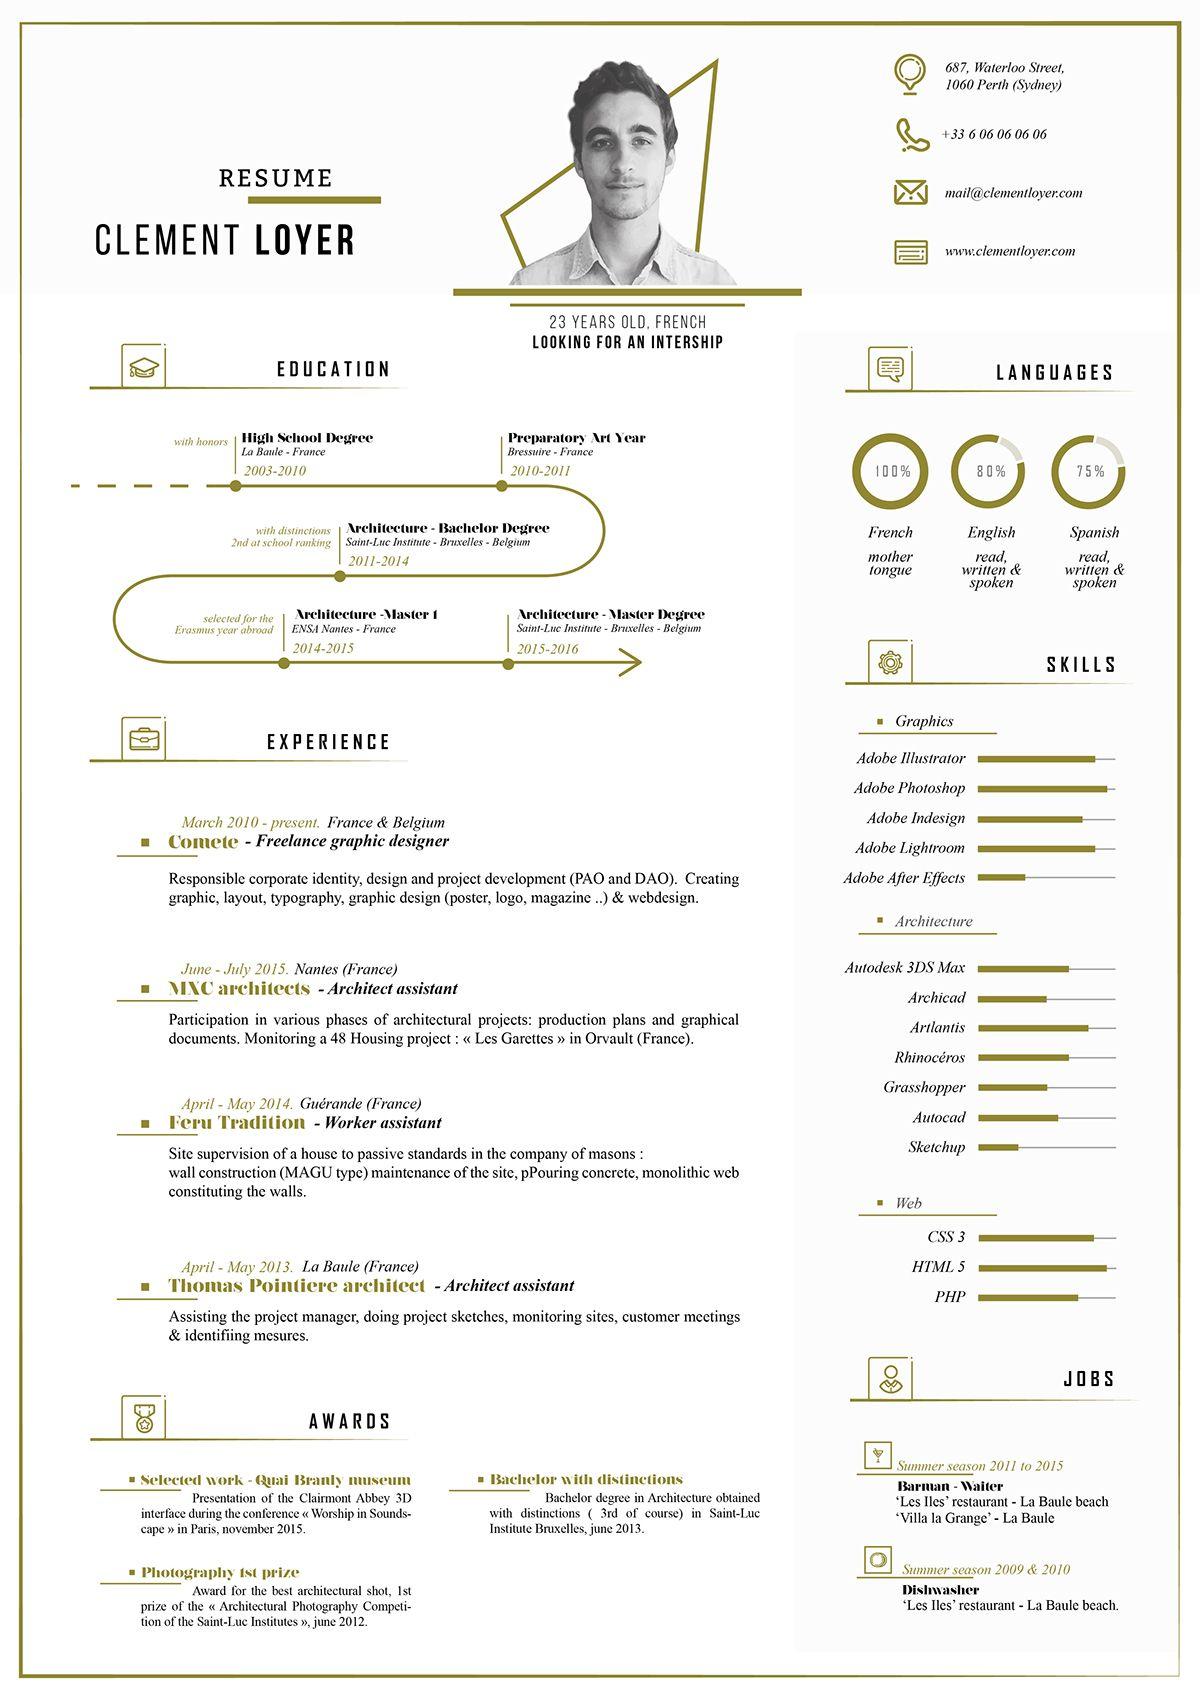 Free Fresh Resume Template Free Design Resources Resume Design Creative Personal Resume Graphic Design Resume